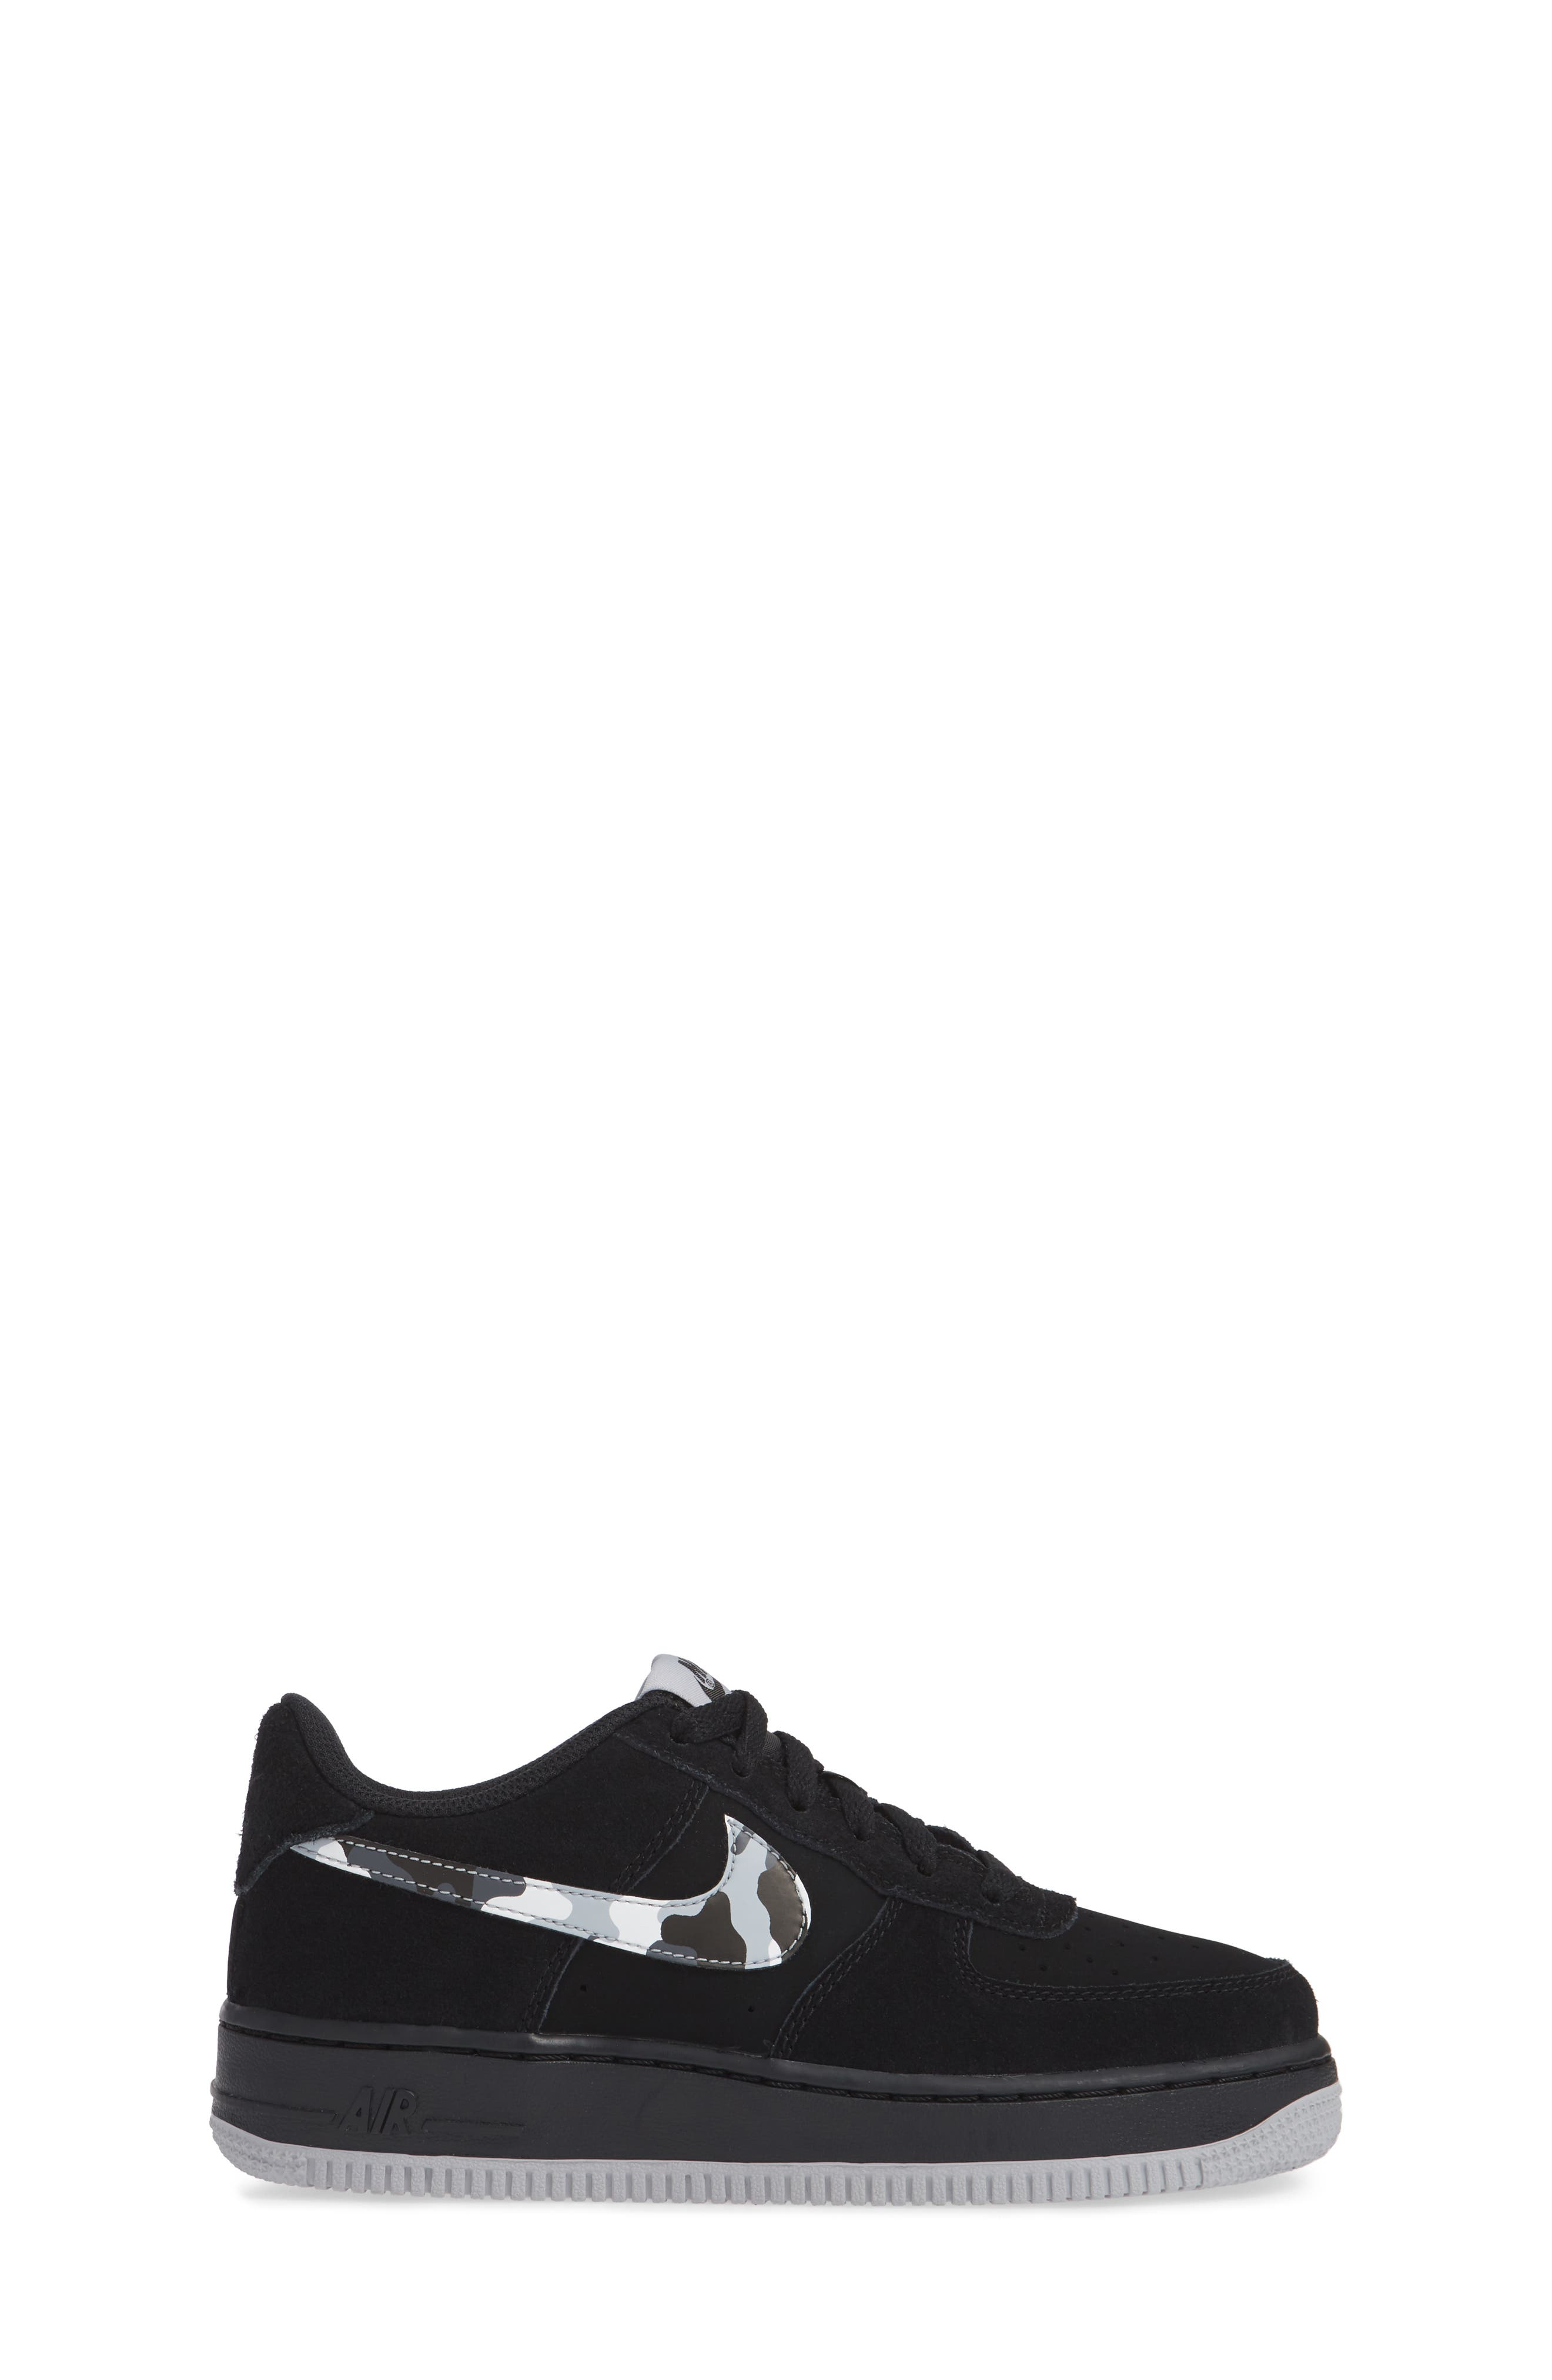 Air Force 1 Sneaker,                             Alternate thumbnail 3, color,                             BLACK/ GREY/ WHITE